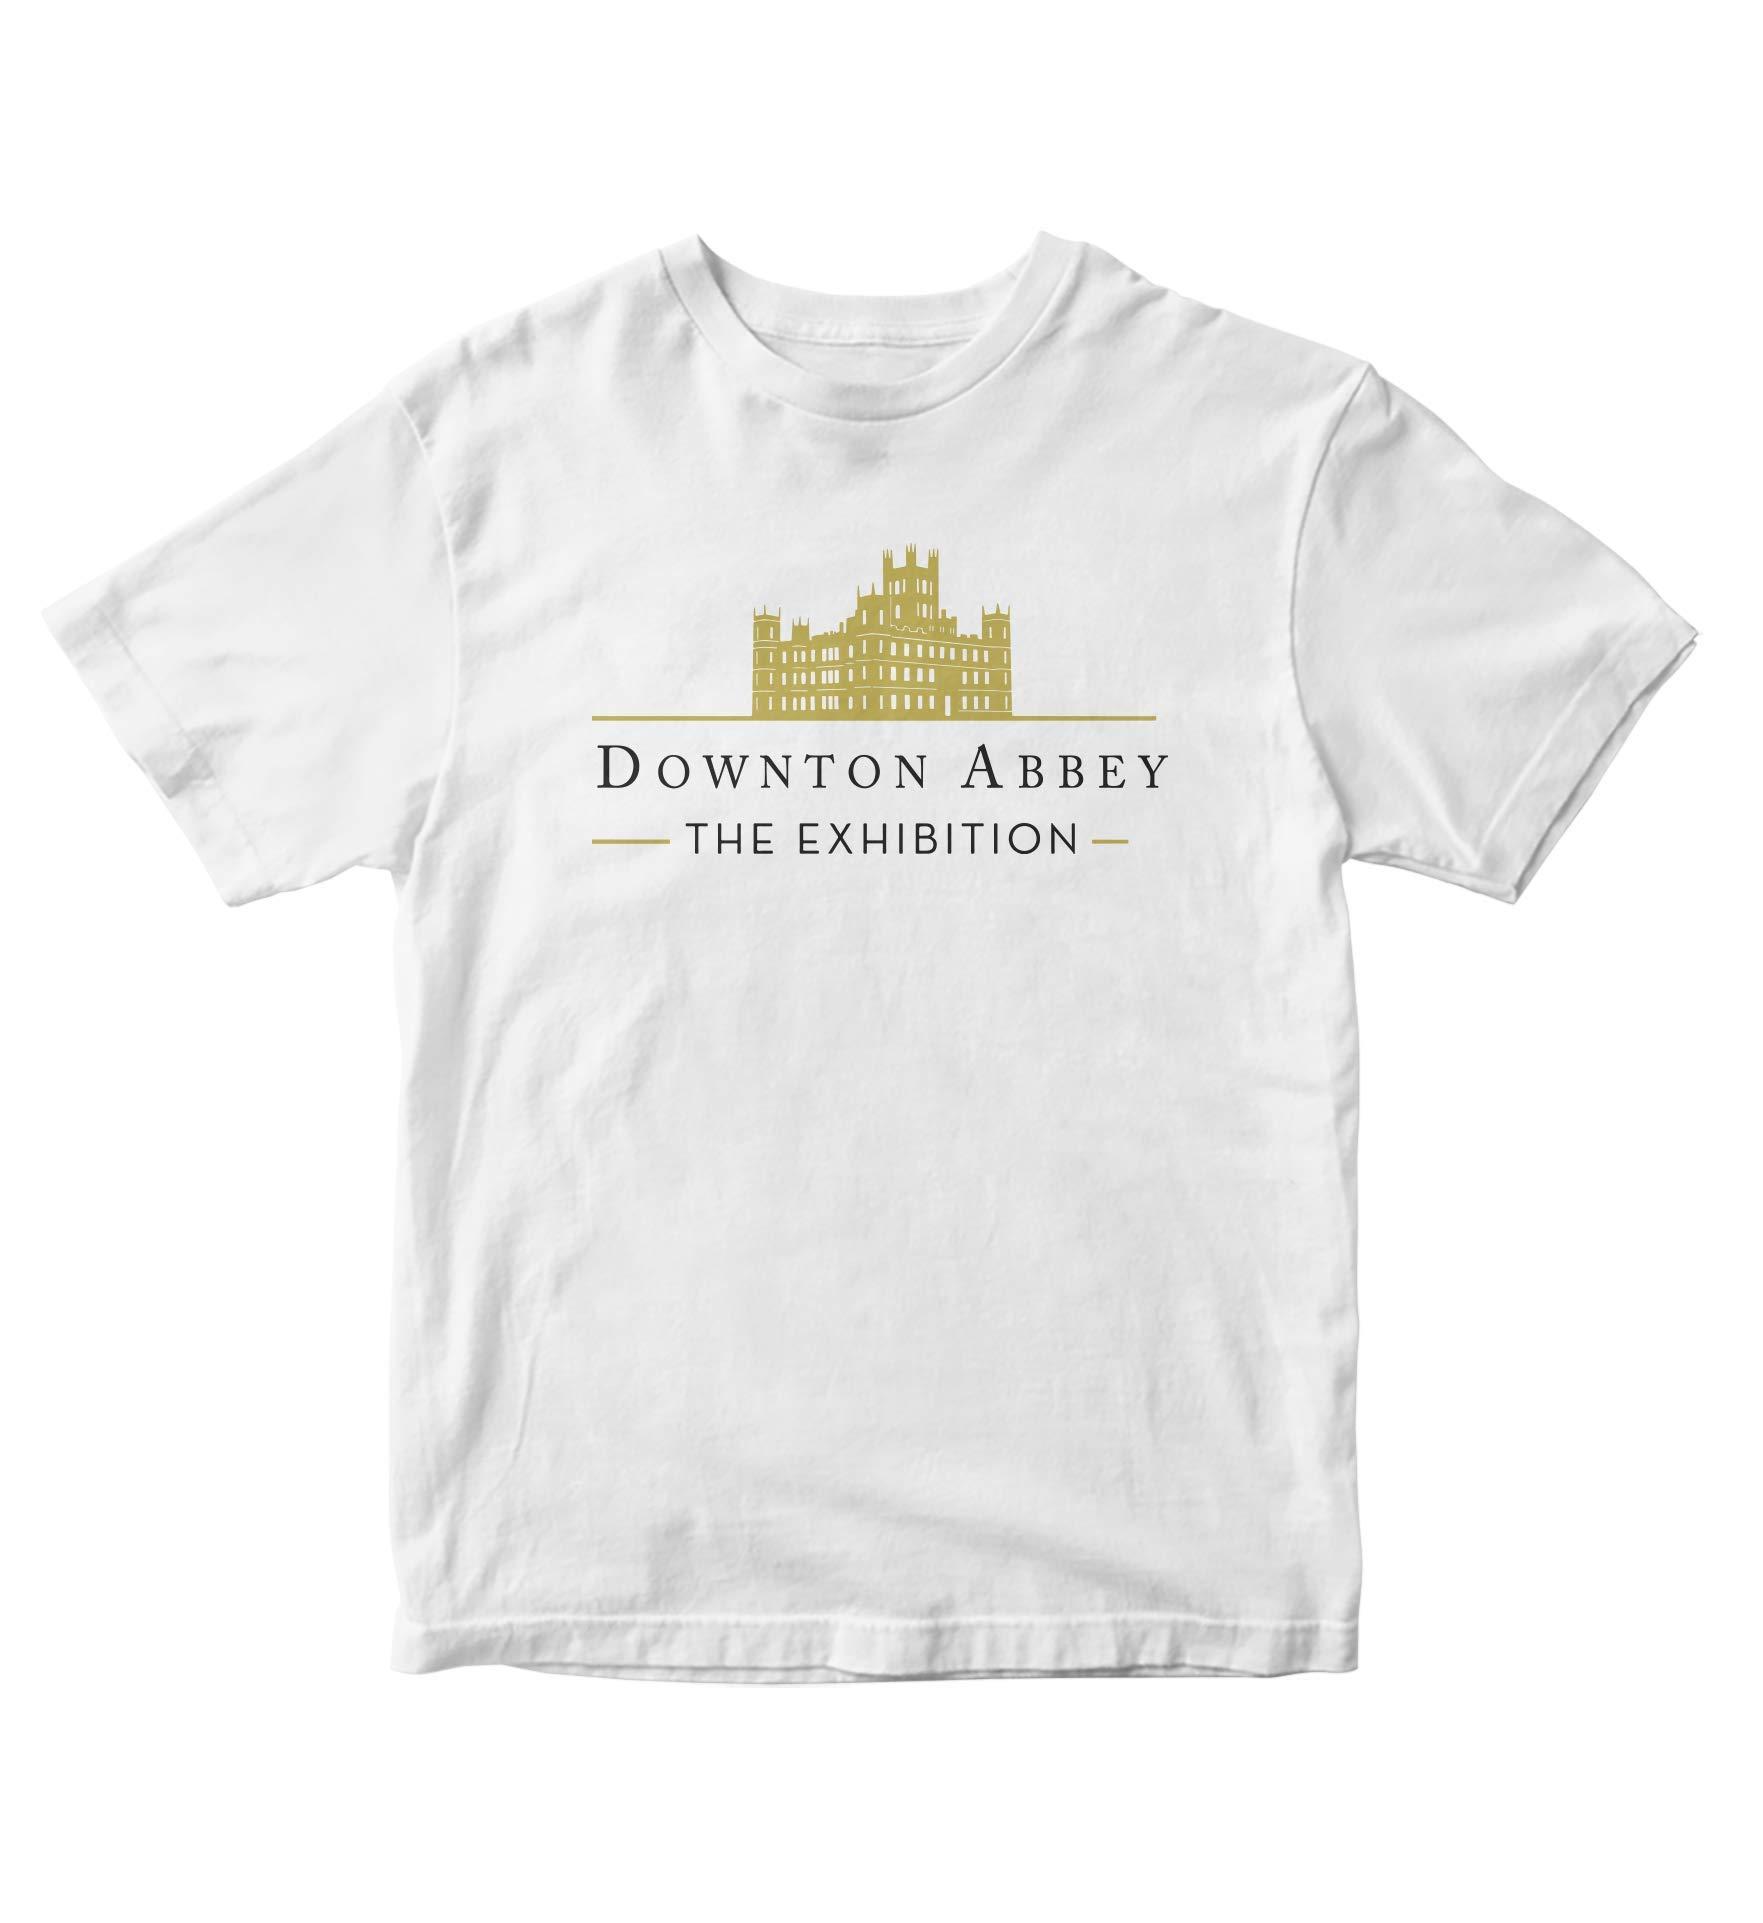 Tjsports Downton Abbey The Exhibition Shirt S Tv Show M172